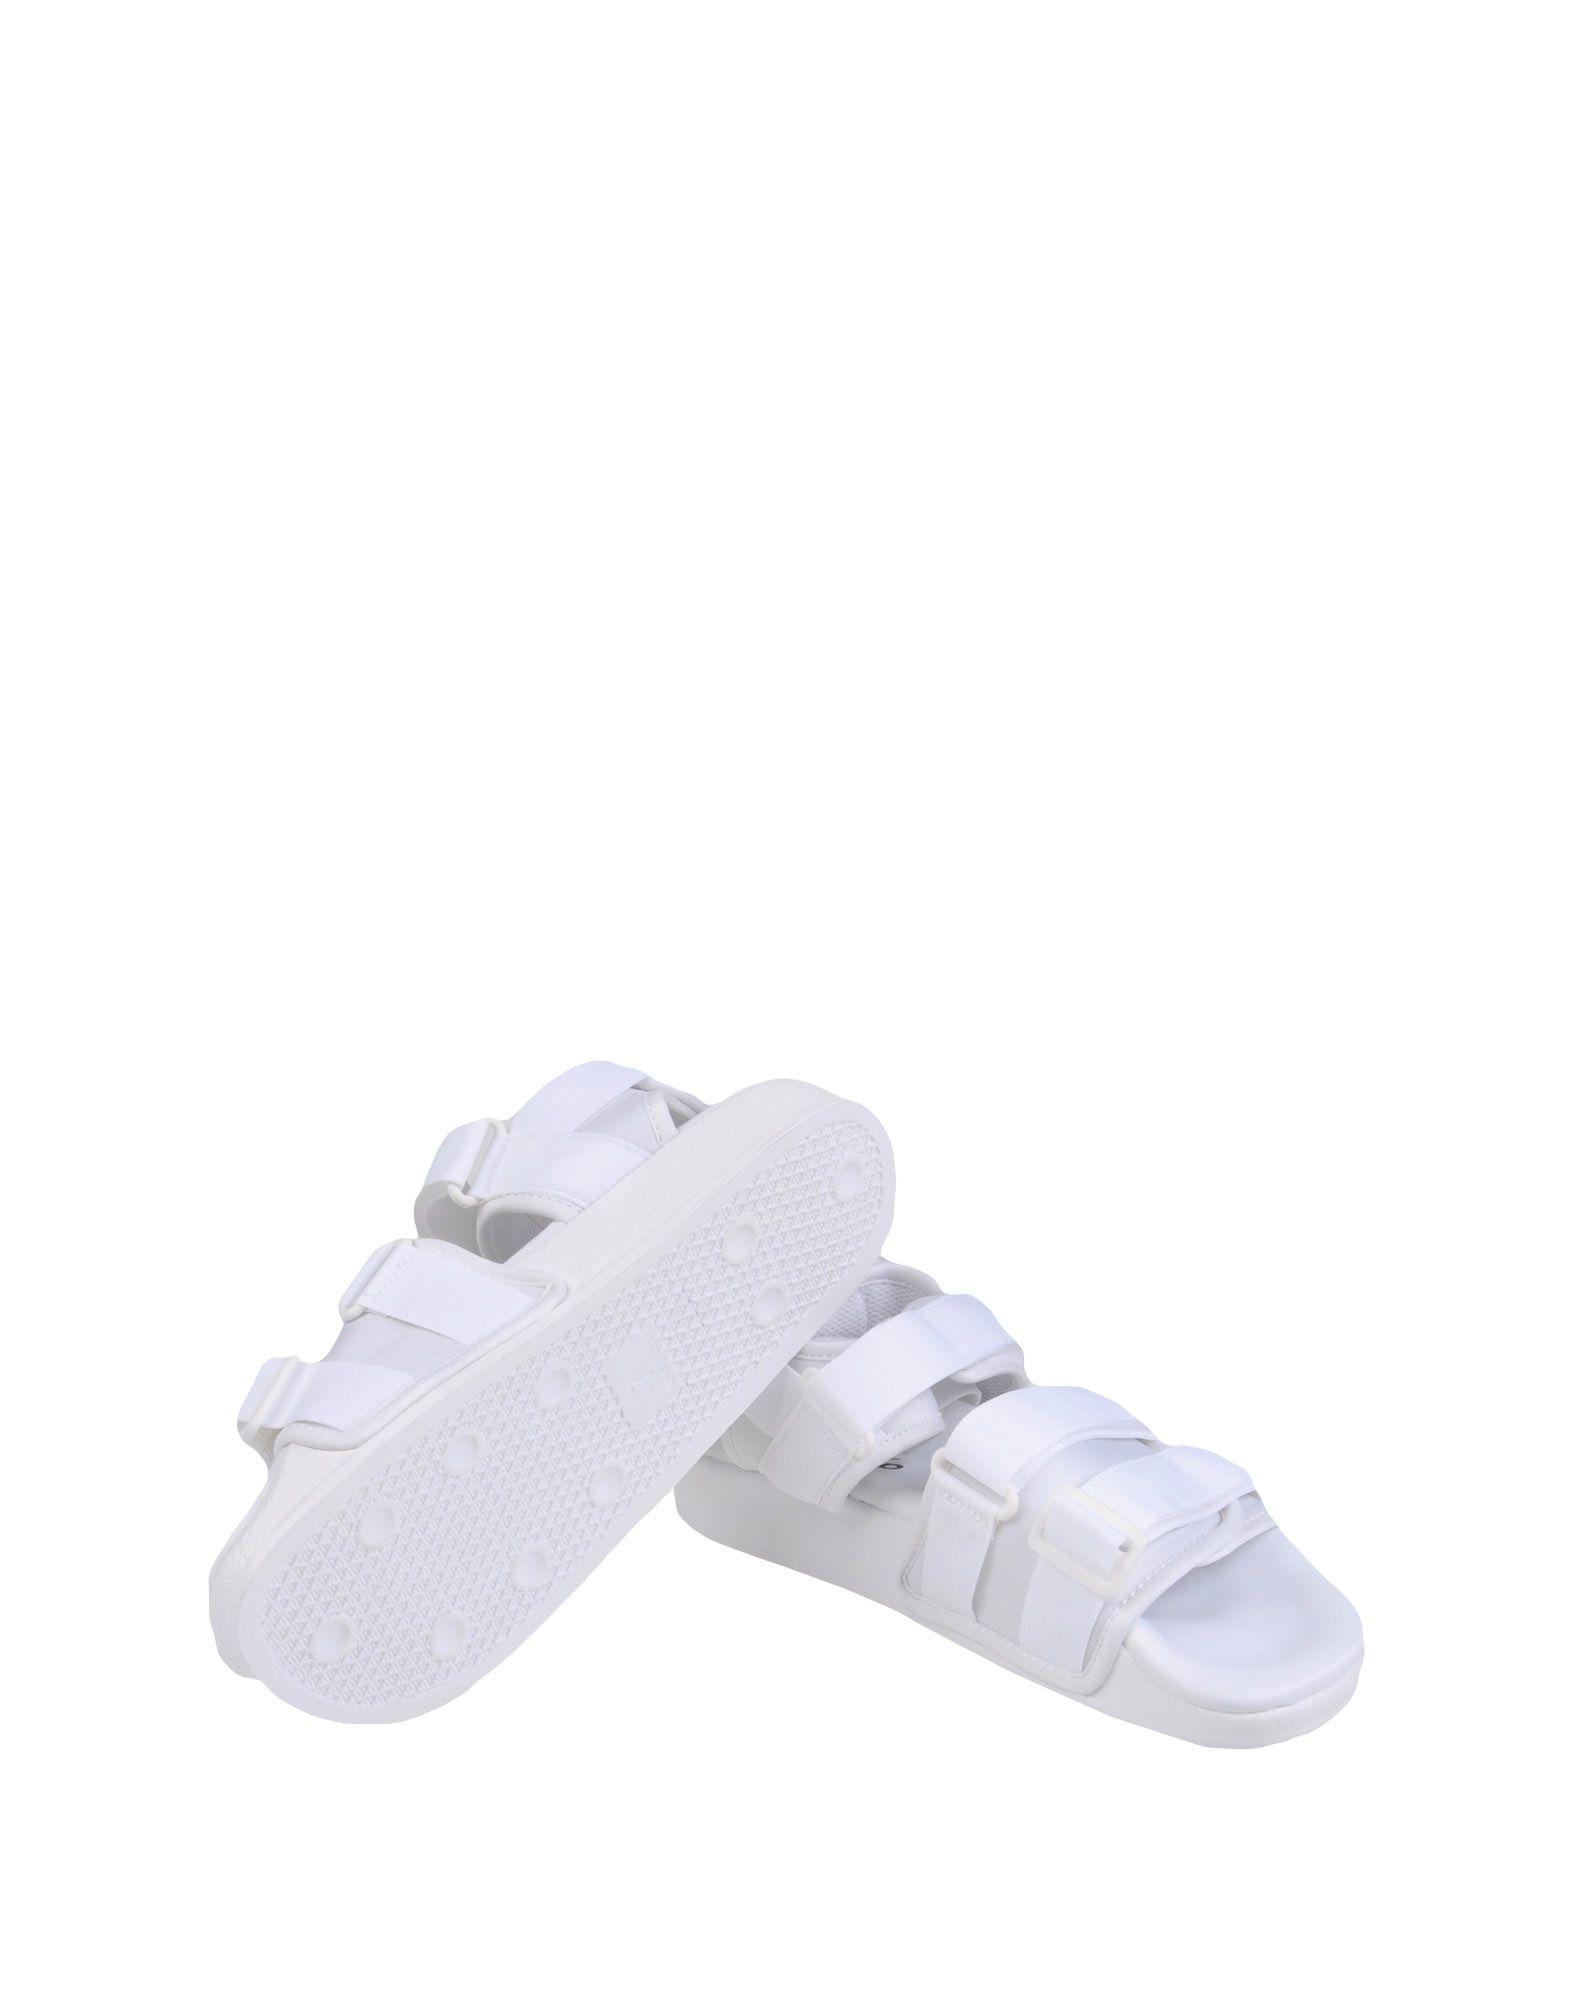 Sandales Adidas Originals Adilette Sandal W - Femme - Sandales Adidas Originals sur